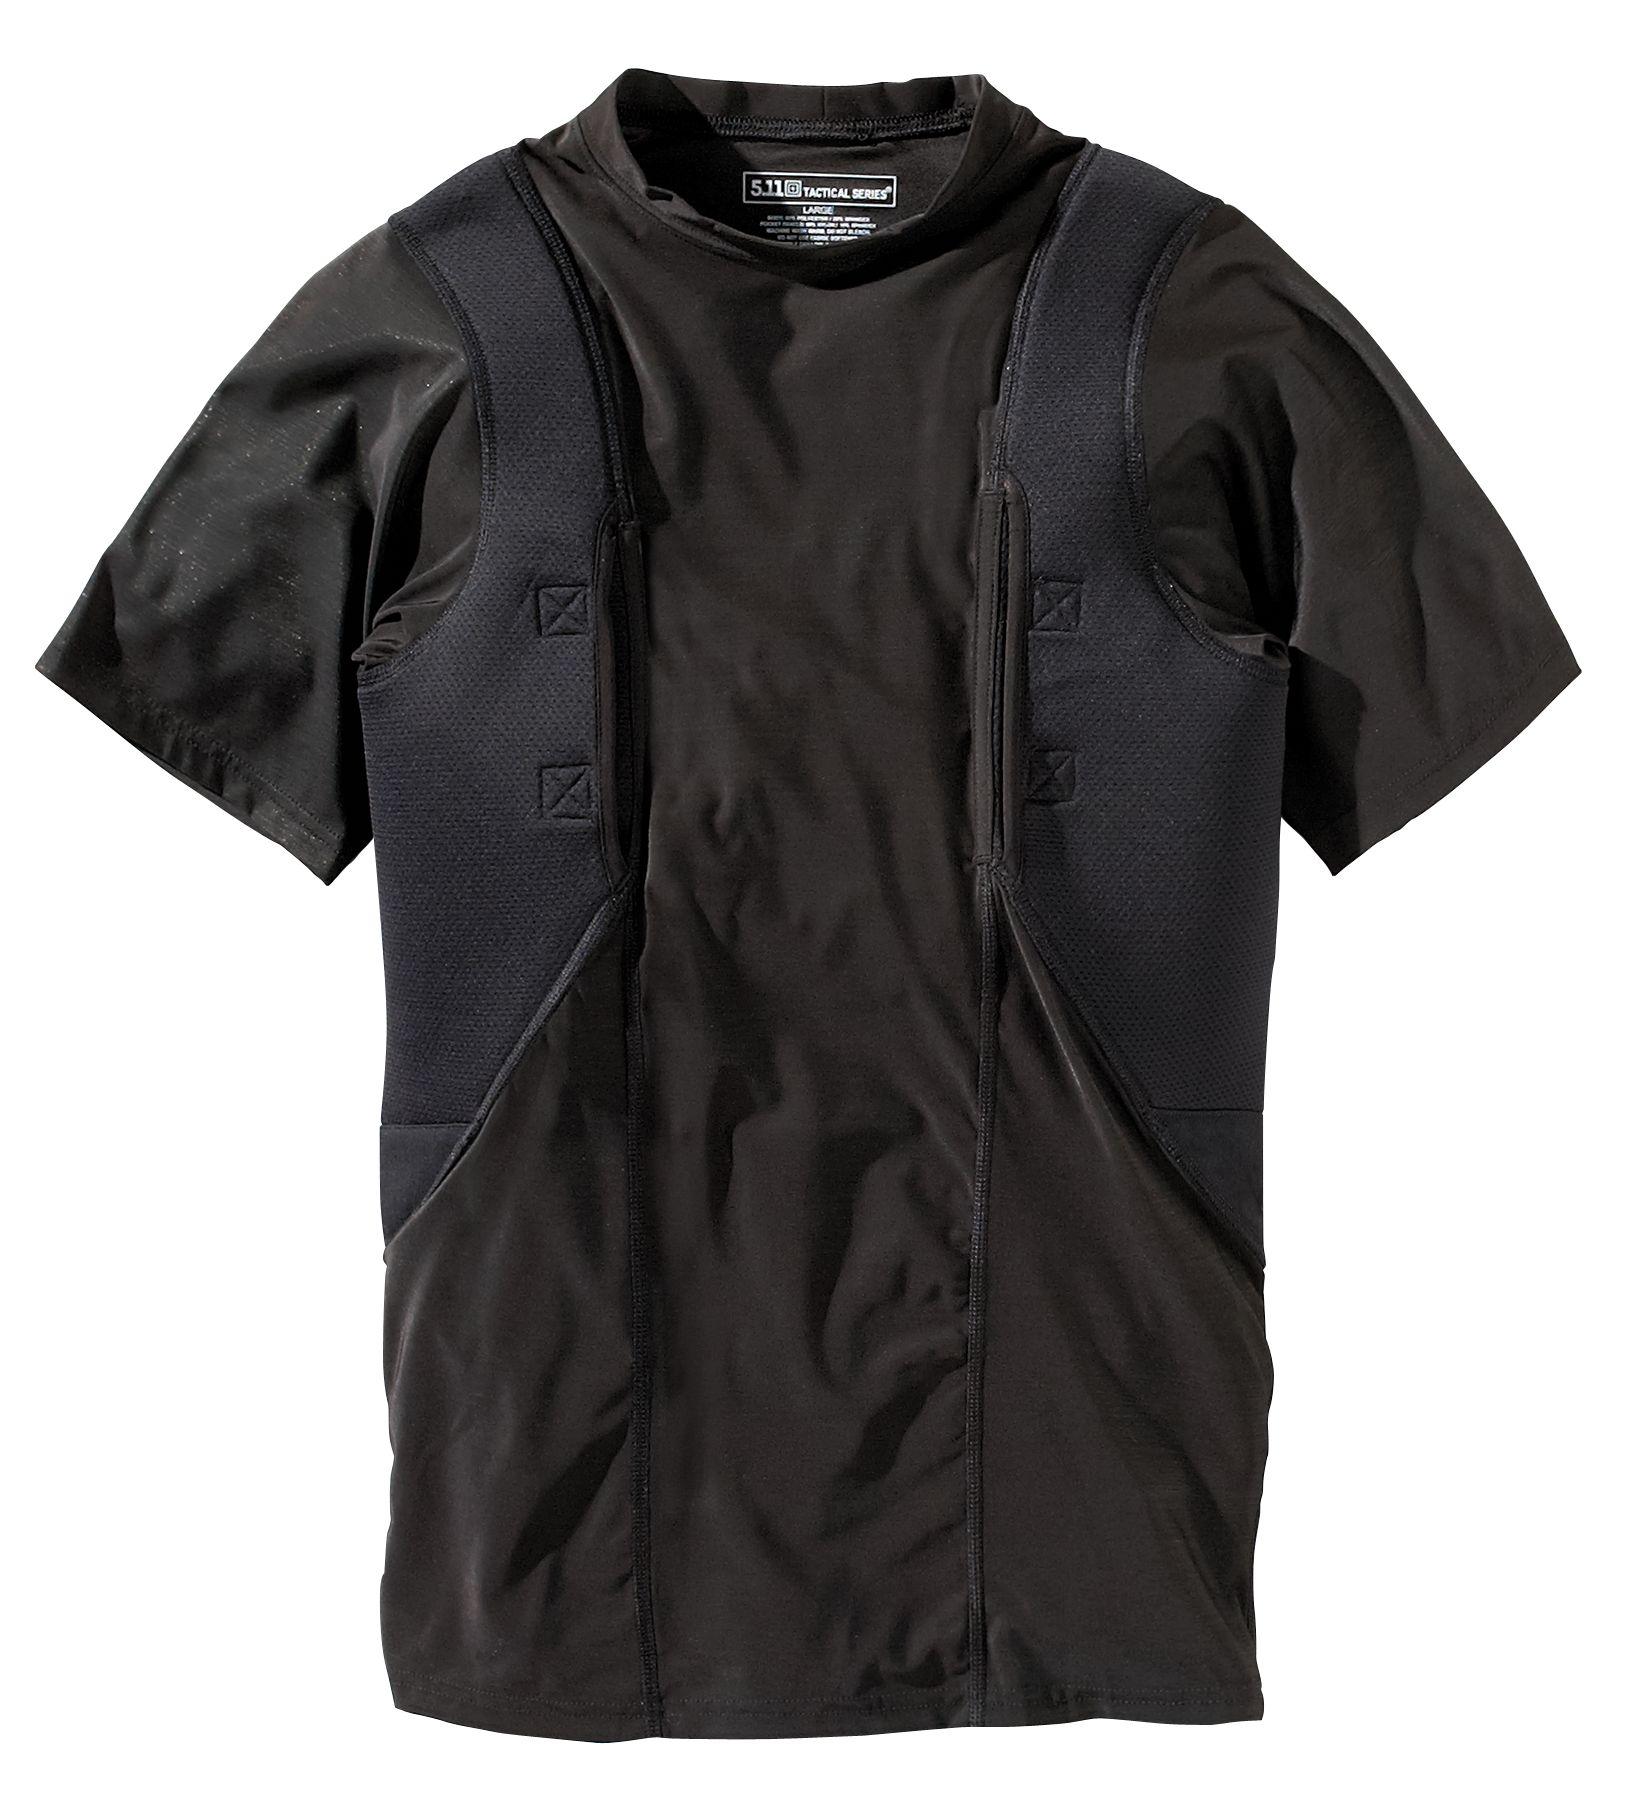 5.11 Tactical Men's Holster Shirt, Size: Medium, Black